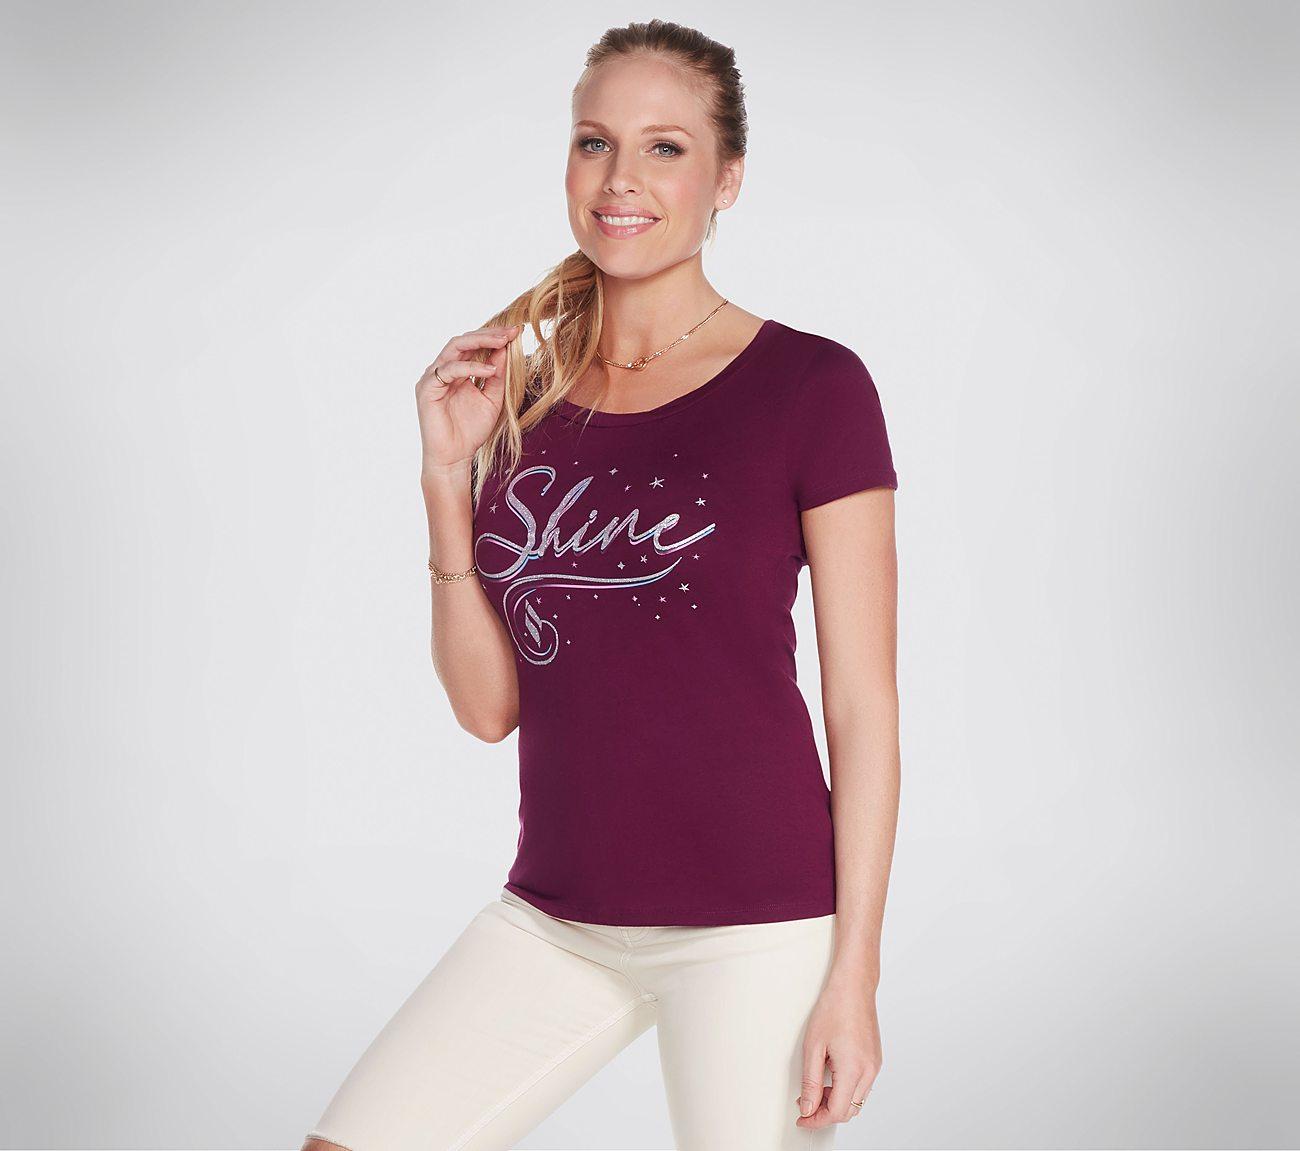 Skechers Apparel Shine Tee Shirt